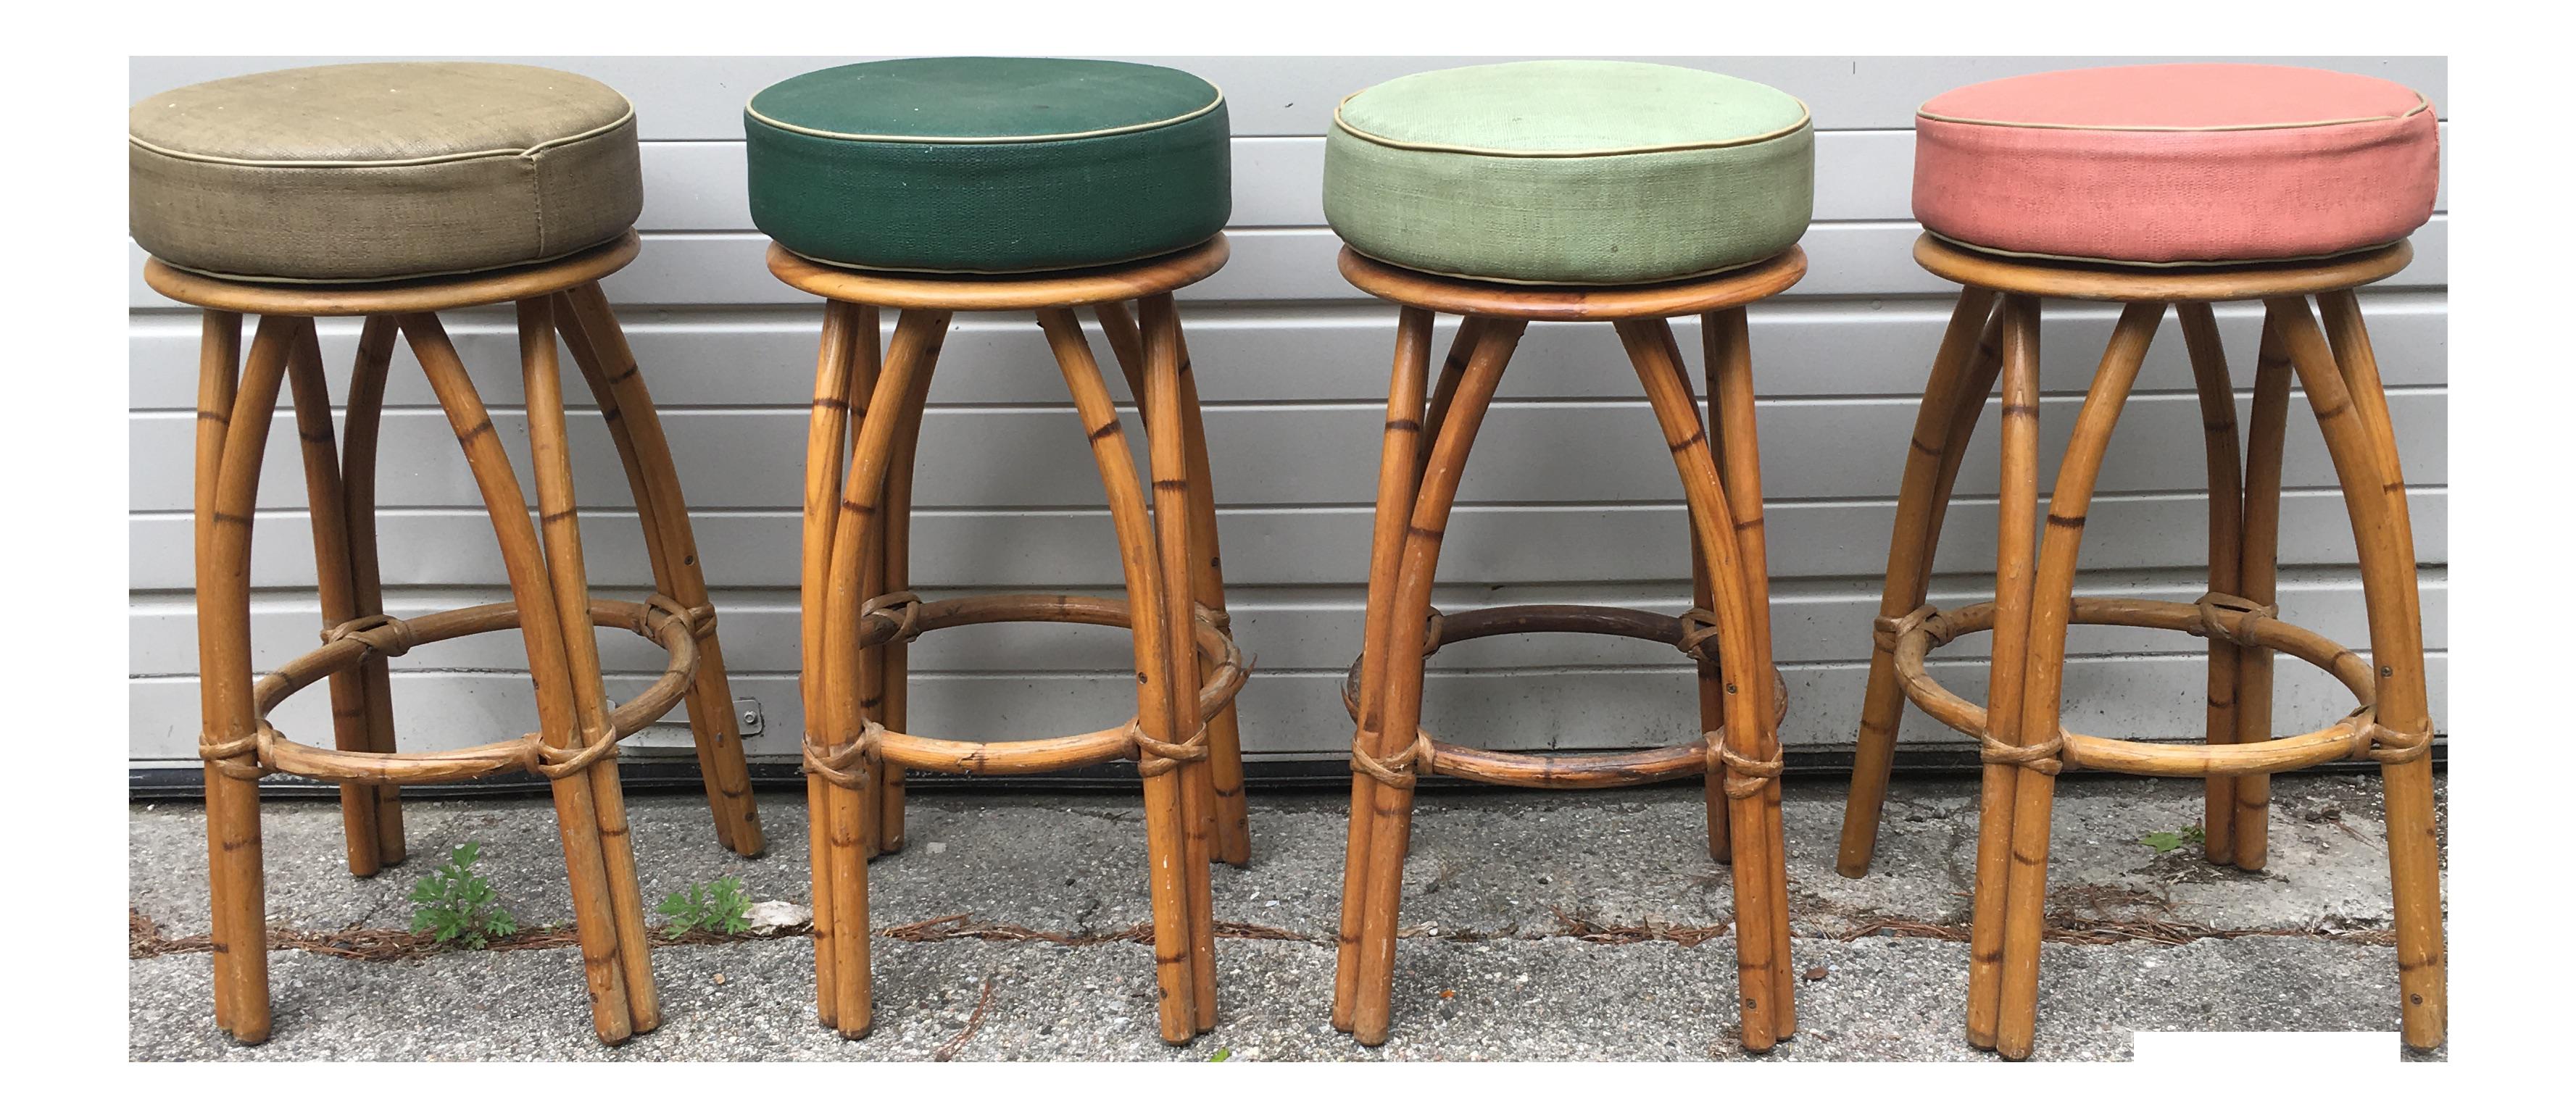 ikea bar dates counter ideas sale stools kitchen folding bamboo stool python